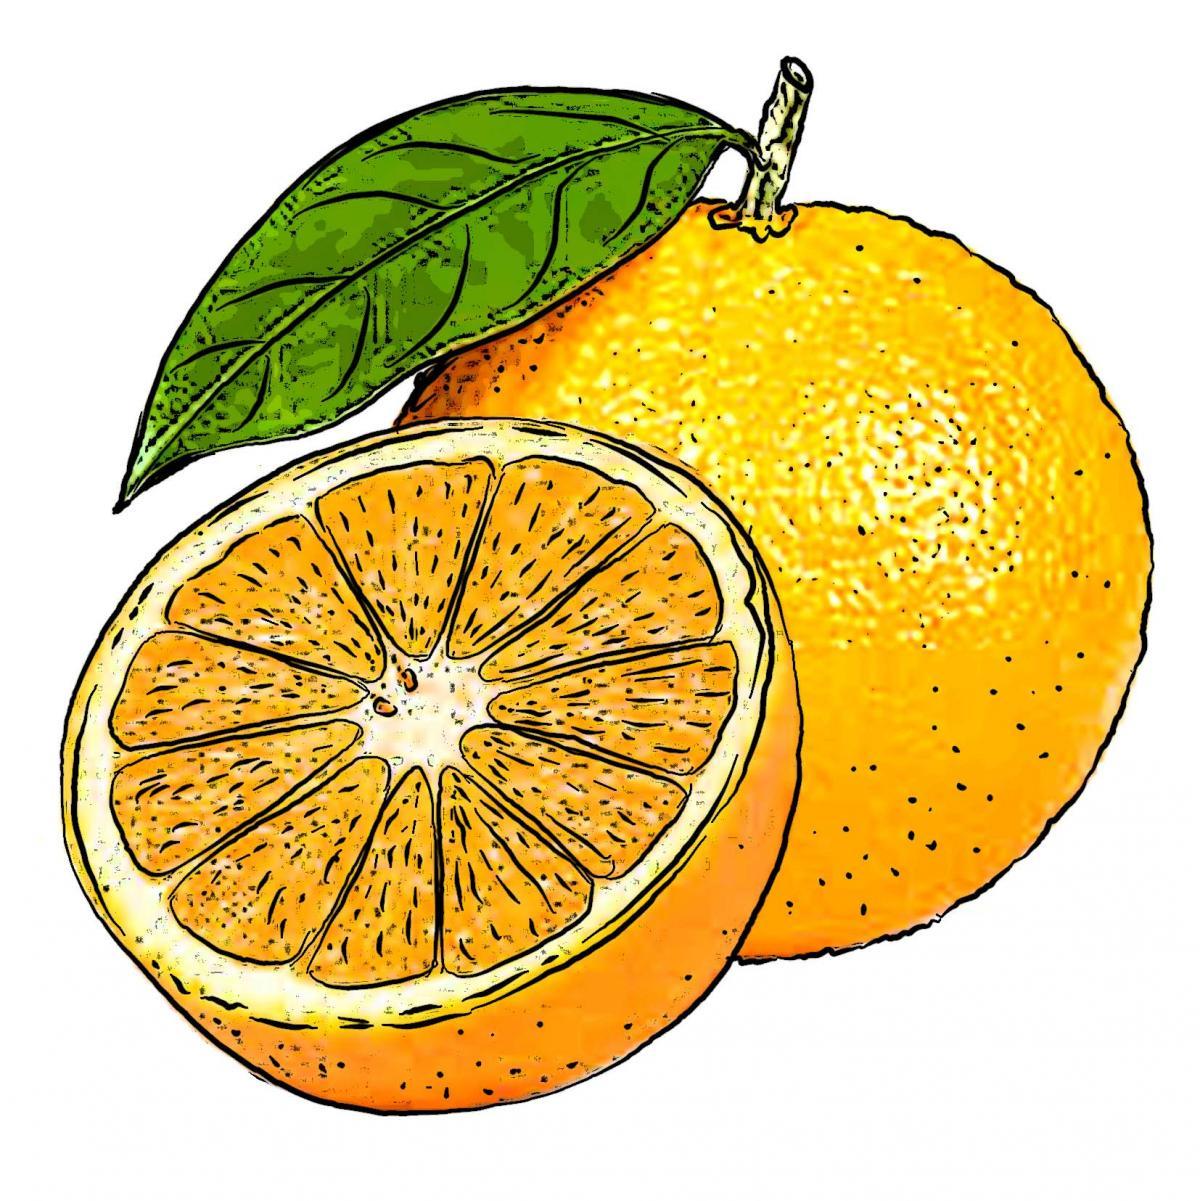 Food - Oranges - 00E - Non-country specific